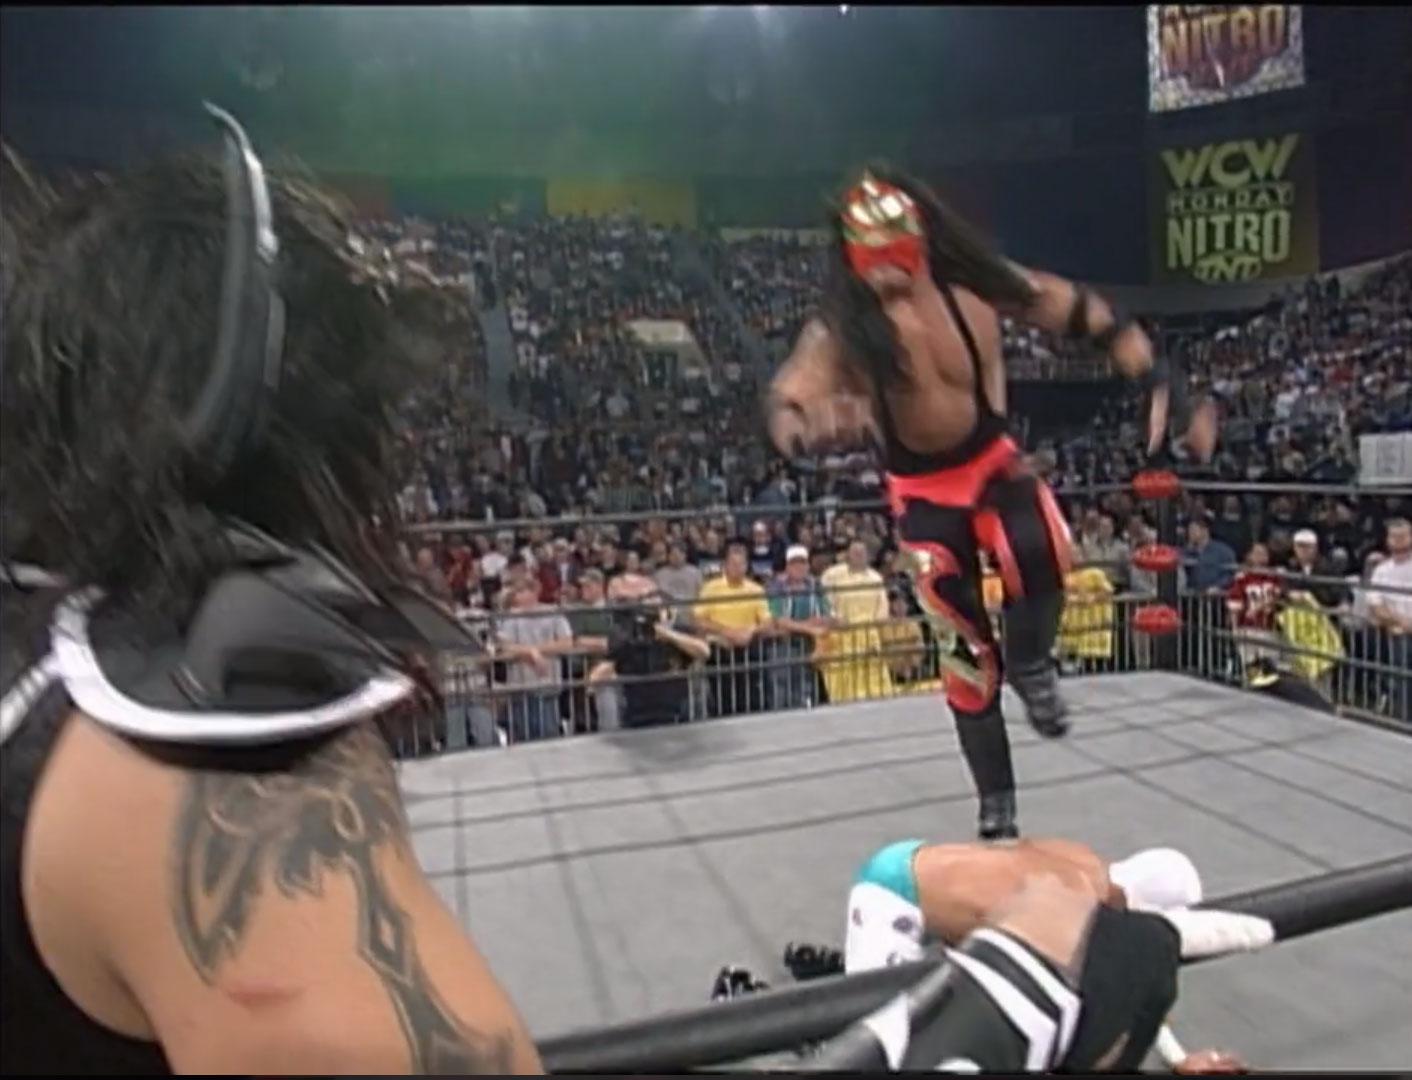 Rey Mysterio Jr. and Juventud Guerrera vs. La Parka and Psychosis WCW Monday NITRO, December 15th 1997